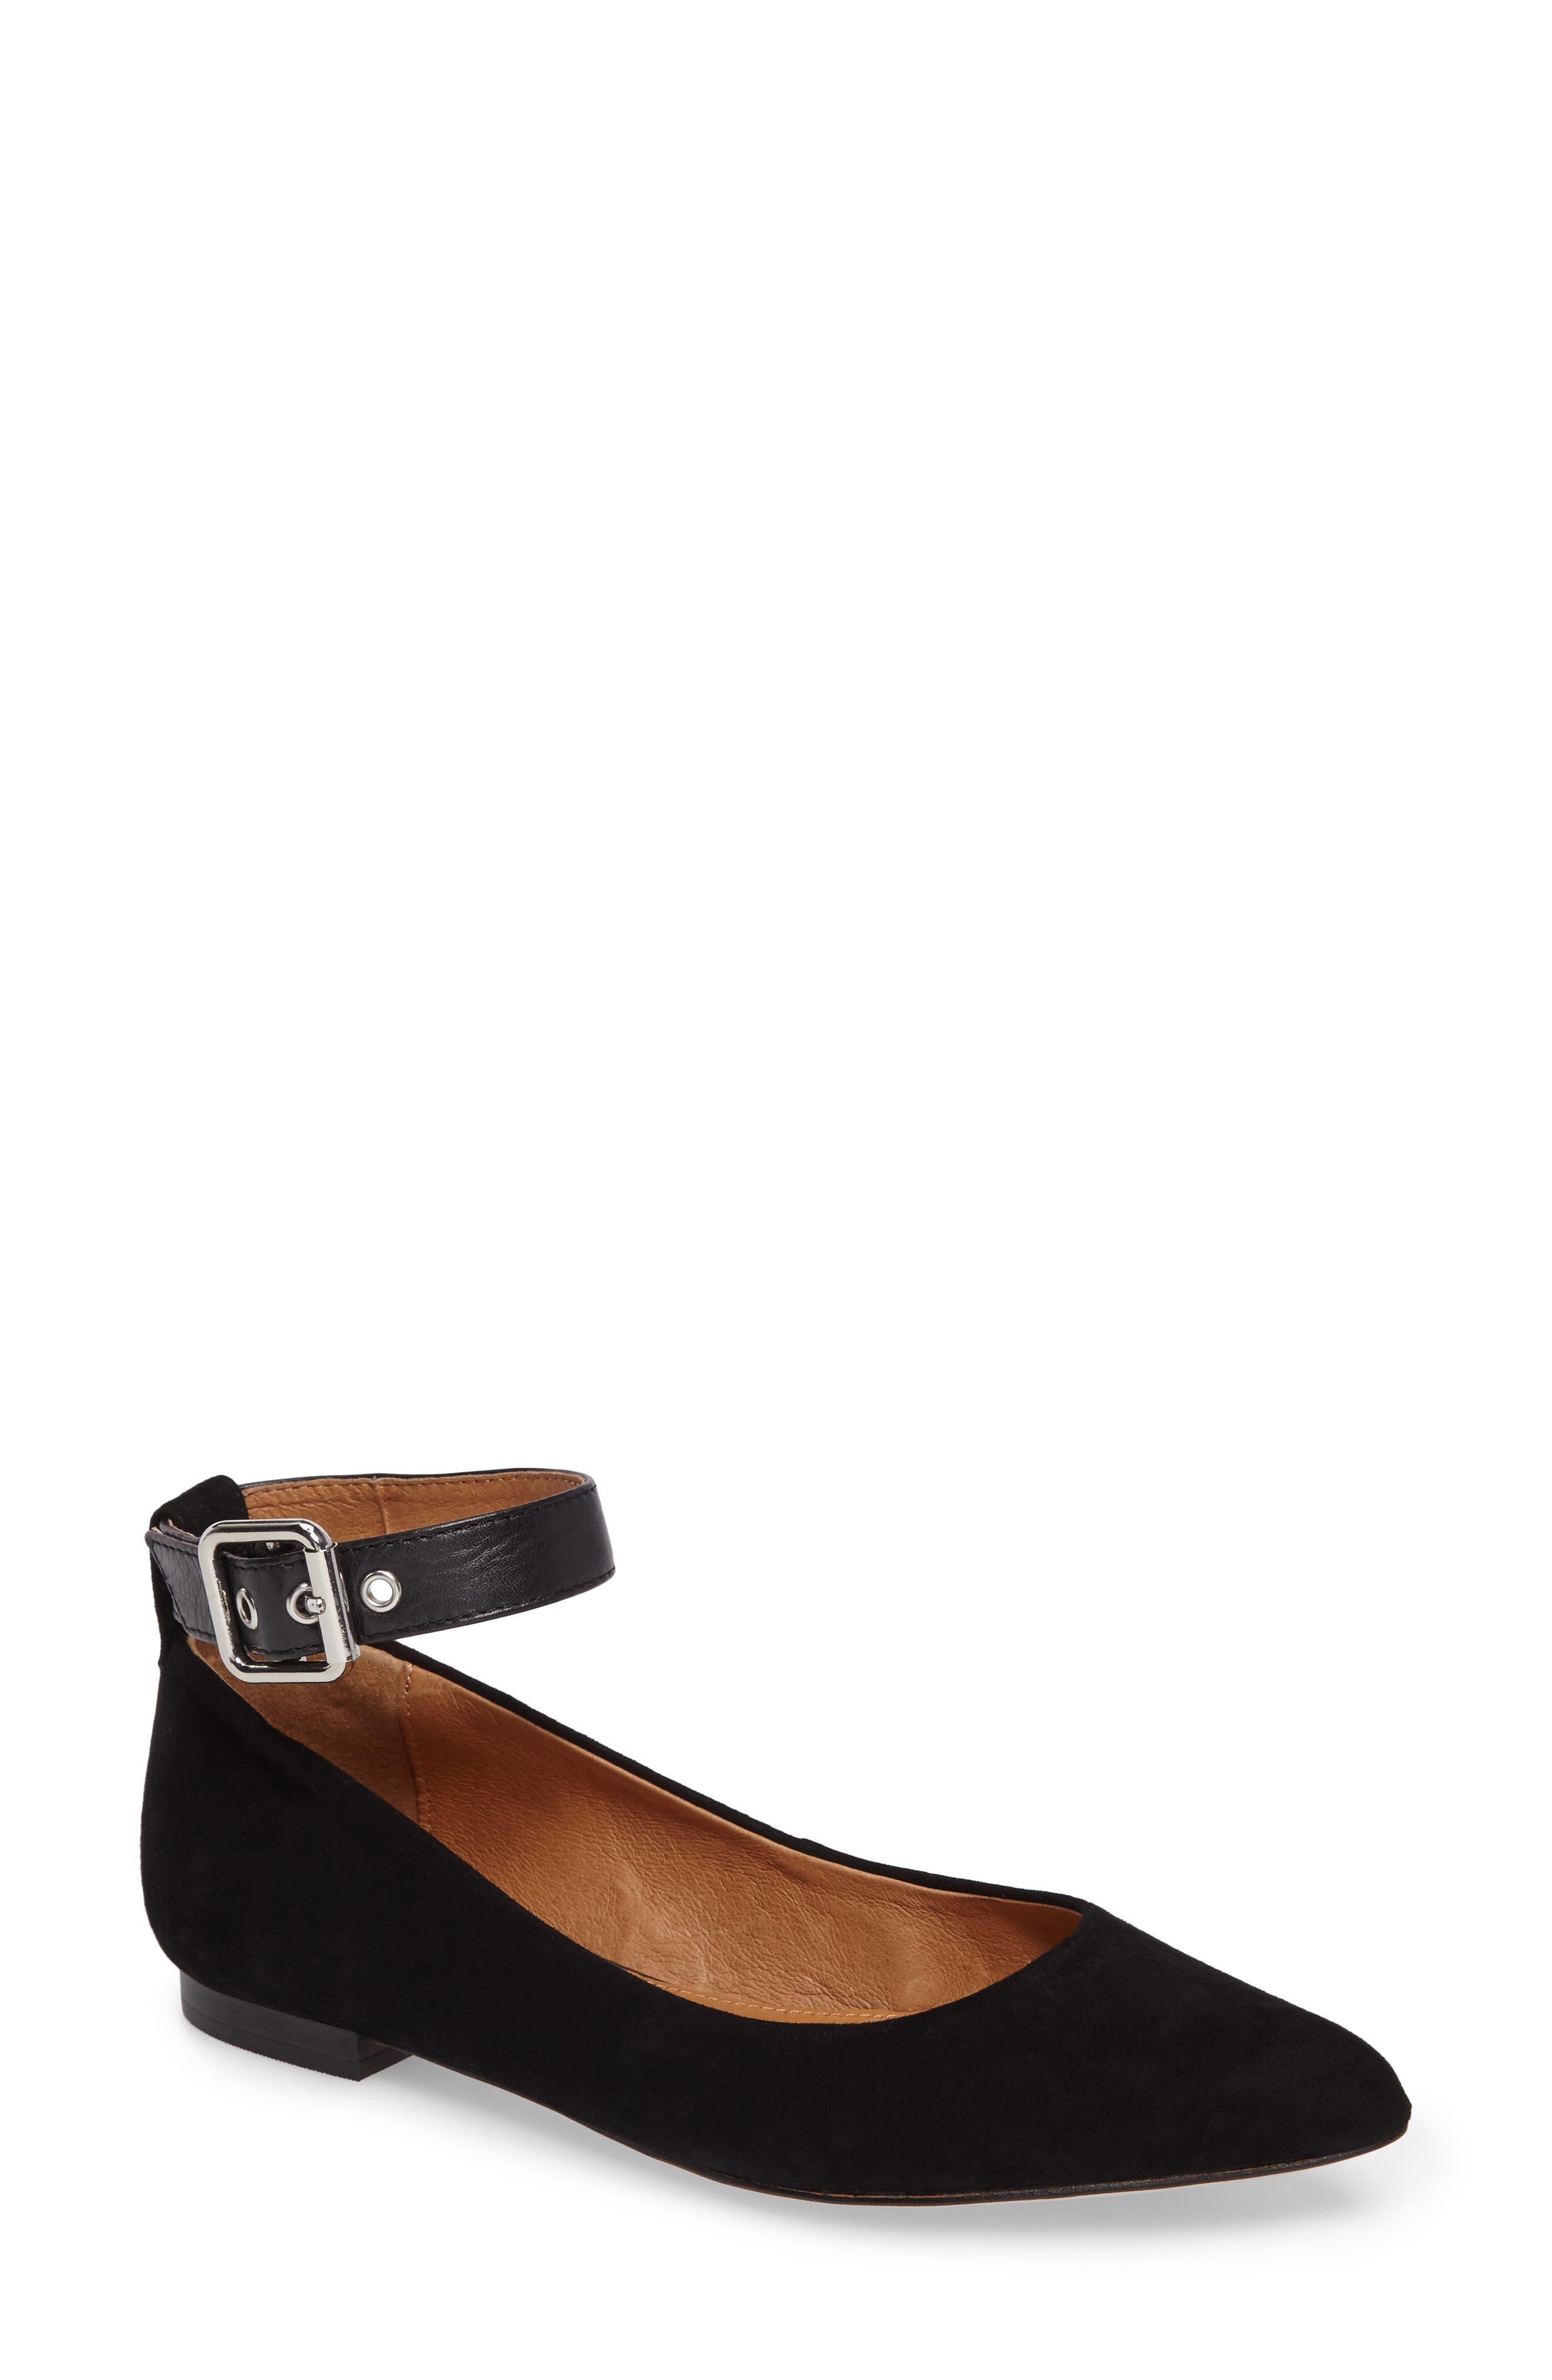 Ramona Ankle Strap Flat,                             Main thumbnail 1, color,                             001